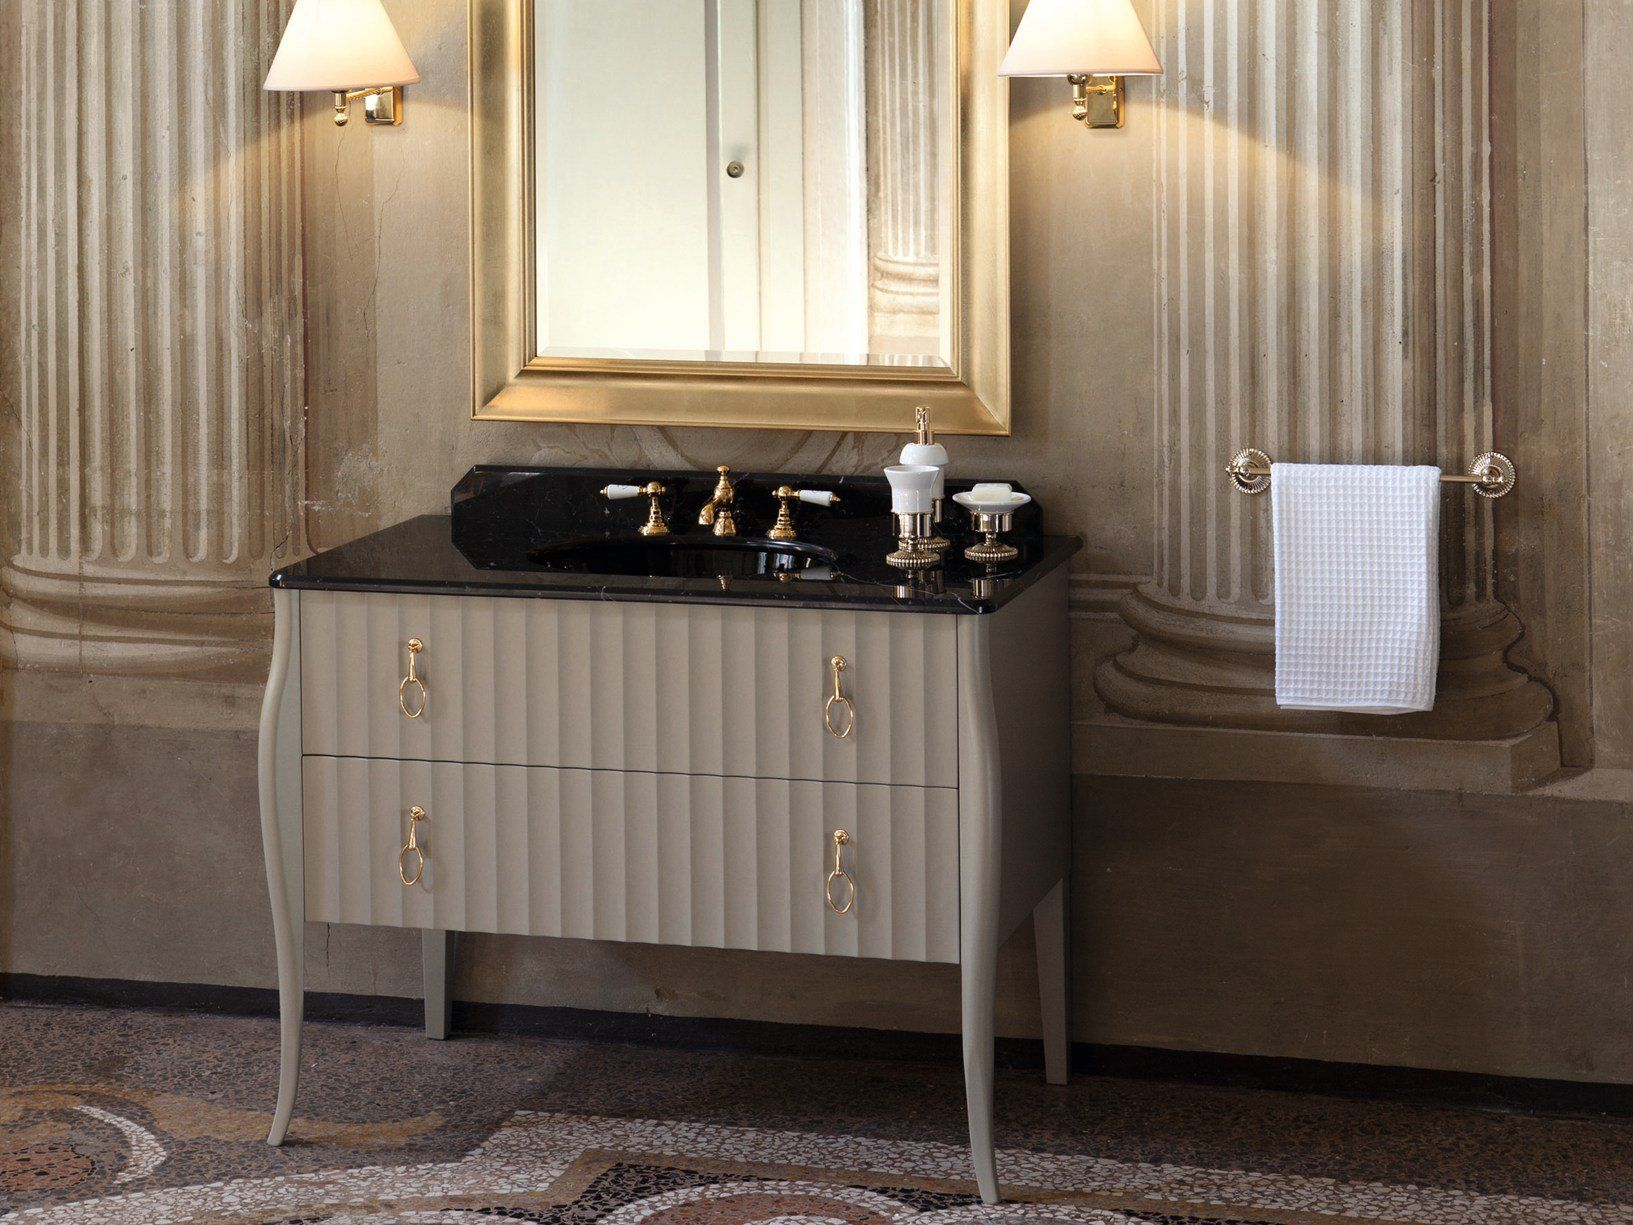 Mobili Da Bagno Eleganti.Gentry Home Presenta I Mobili Da Bagno Charlotte